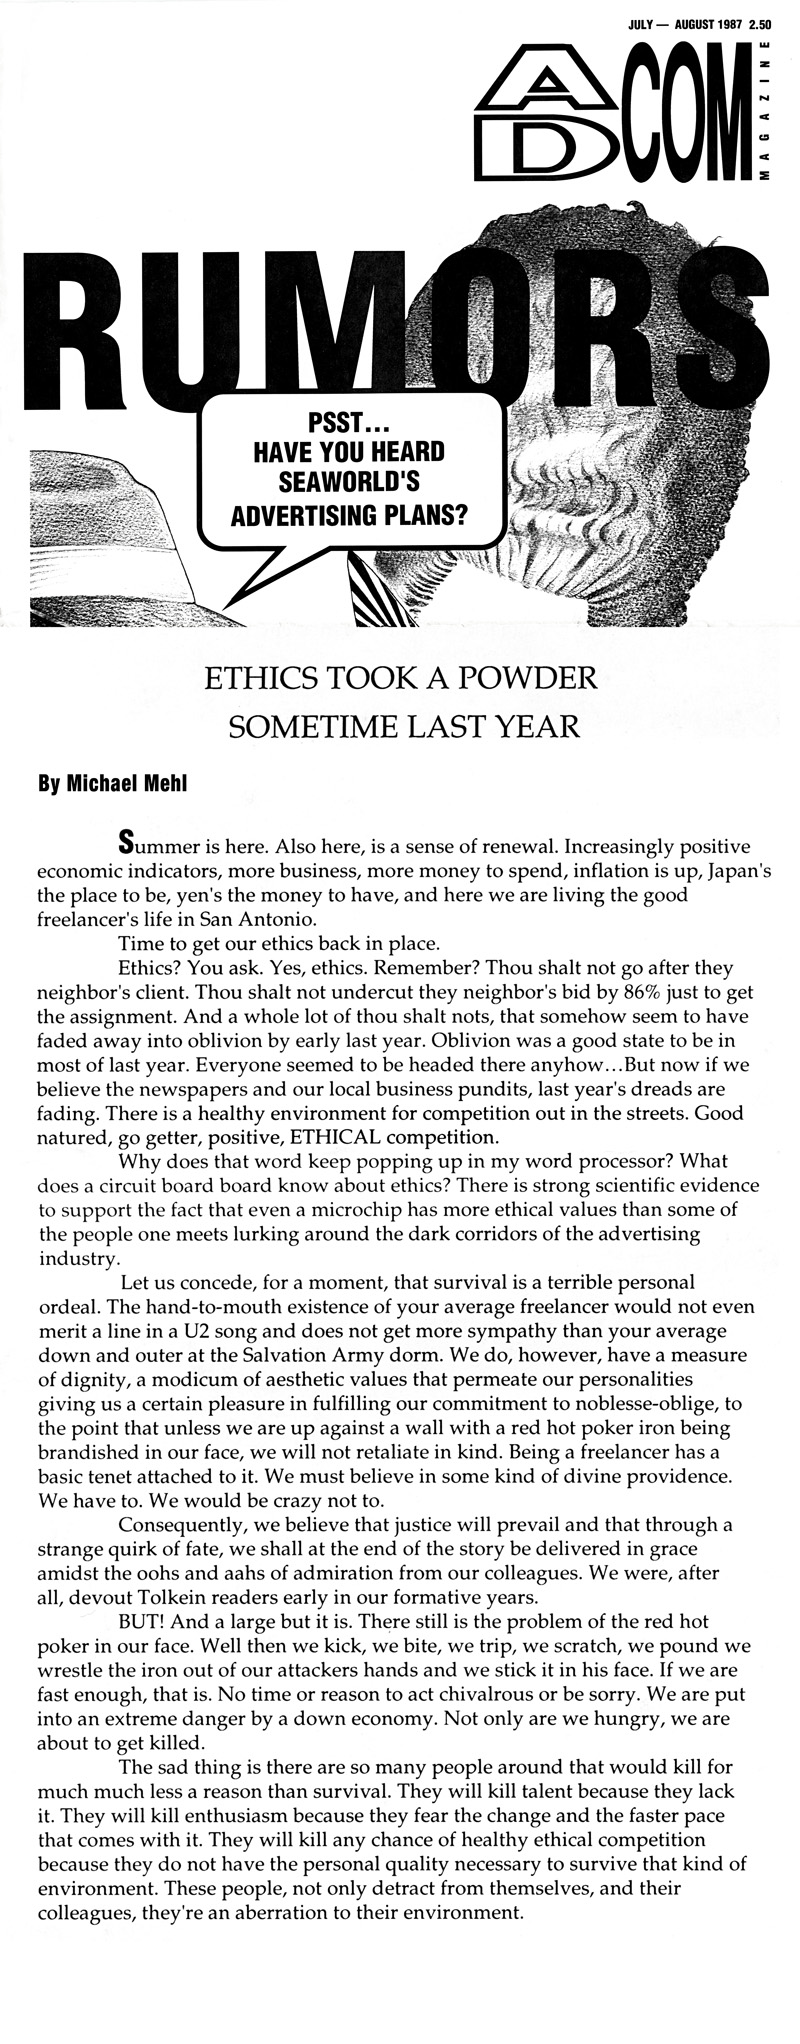 1987_Michael-Mehl_The-Highlight-Zone_Ad-Com-Magazine-Column_03